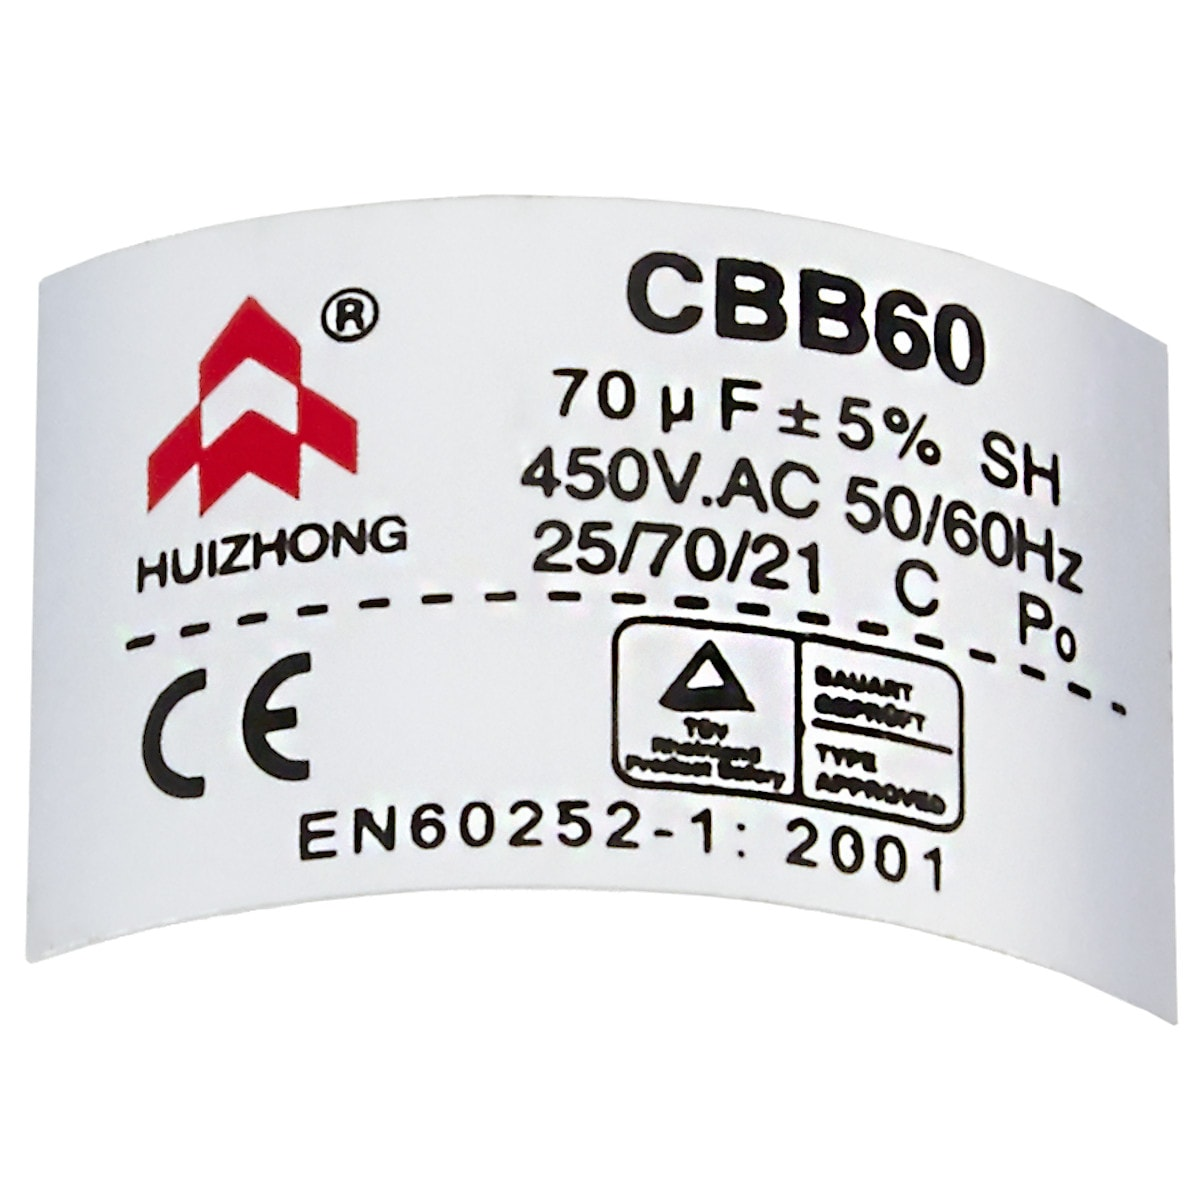 Kondensator 70 µF CBB60 Cotech